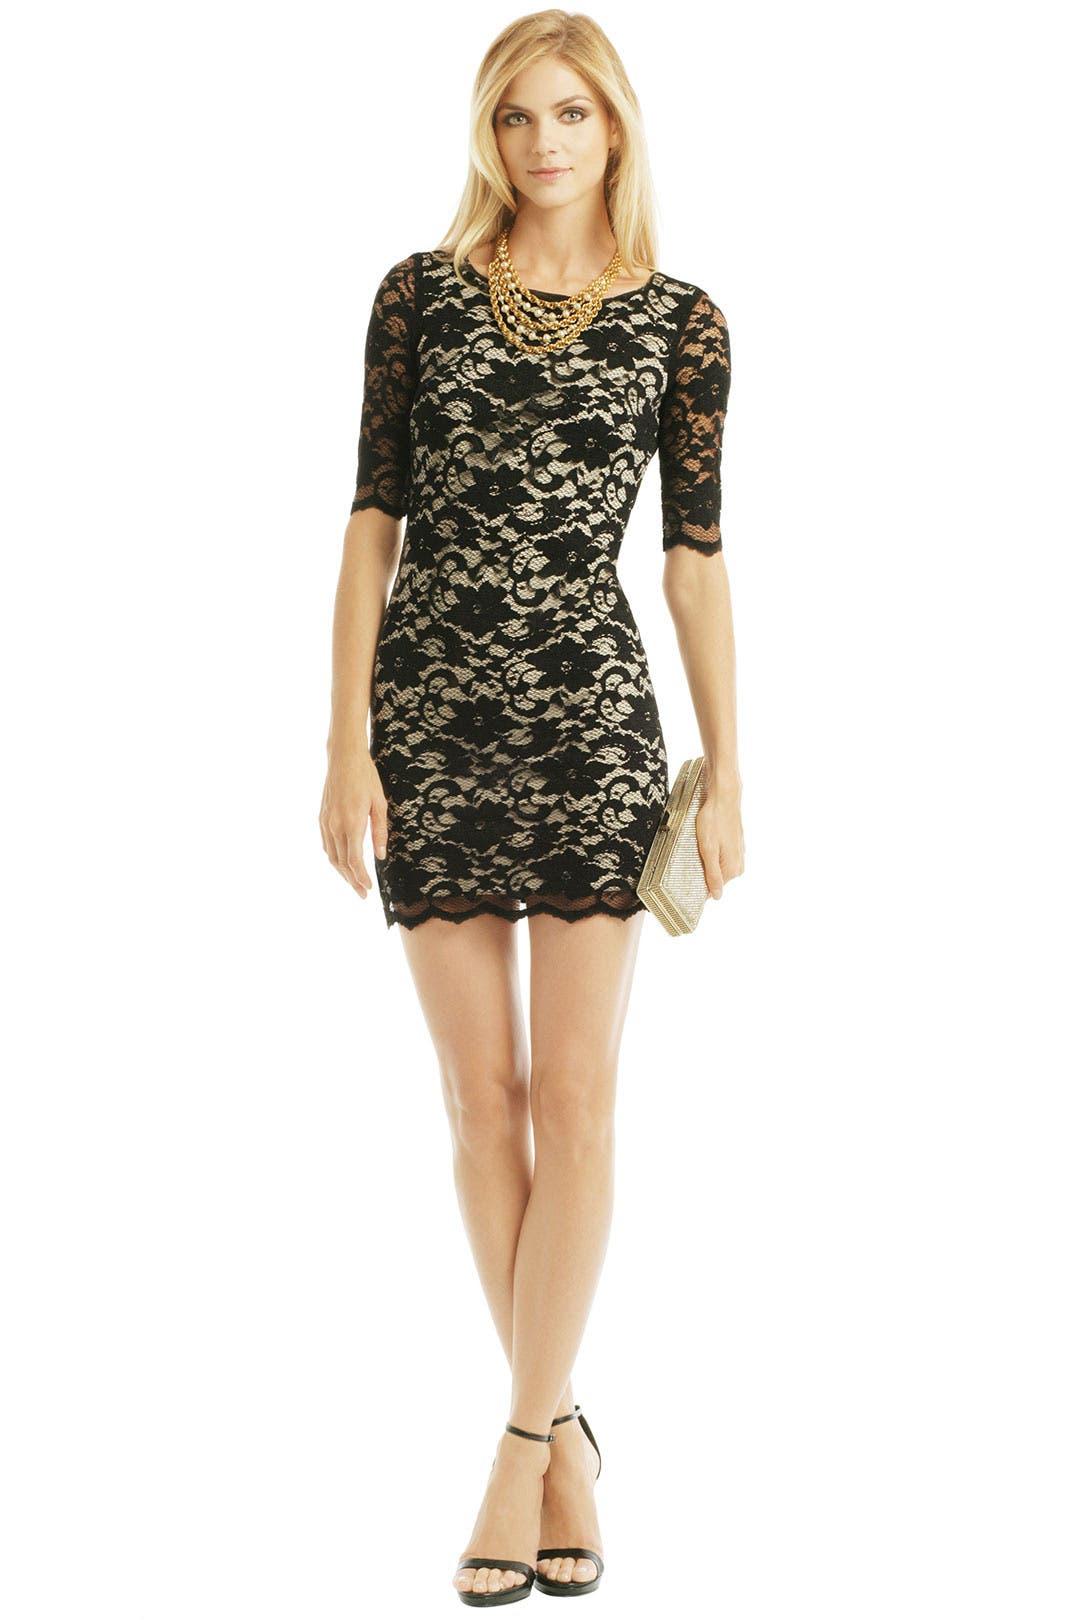 Amanda Dress by Slate & Willow